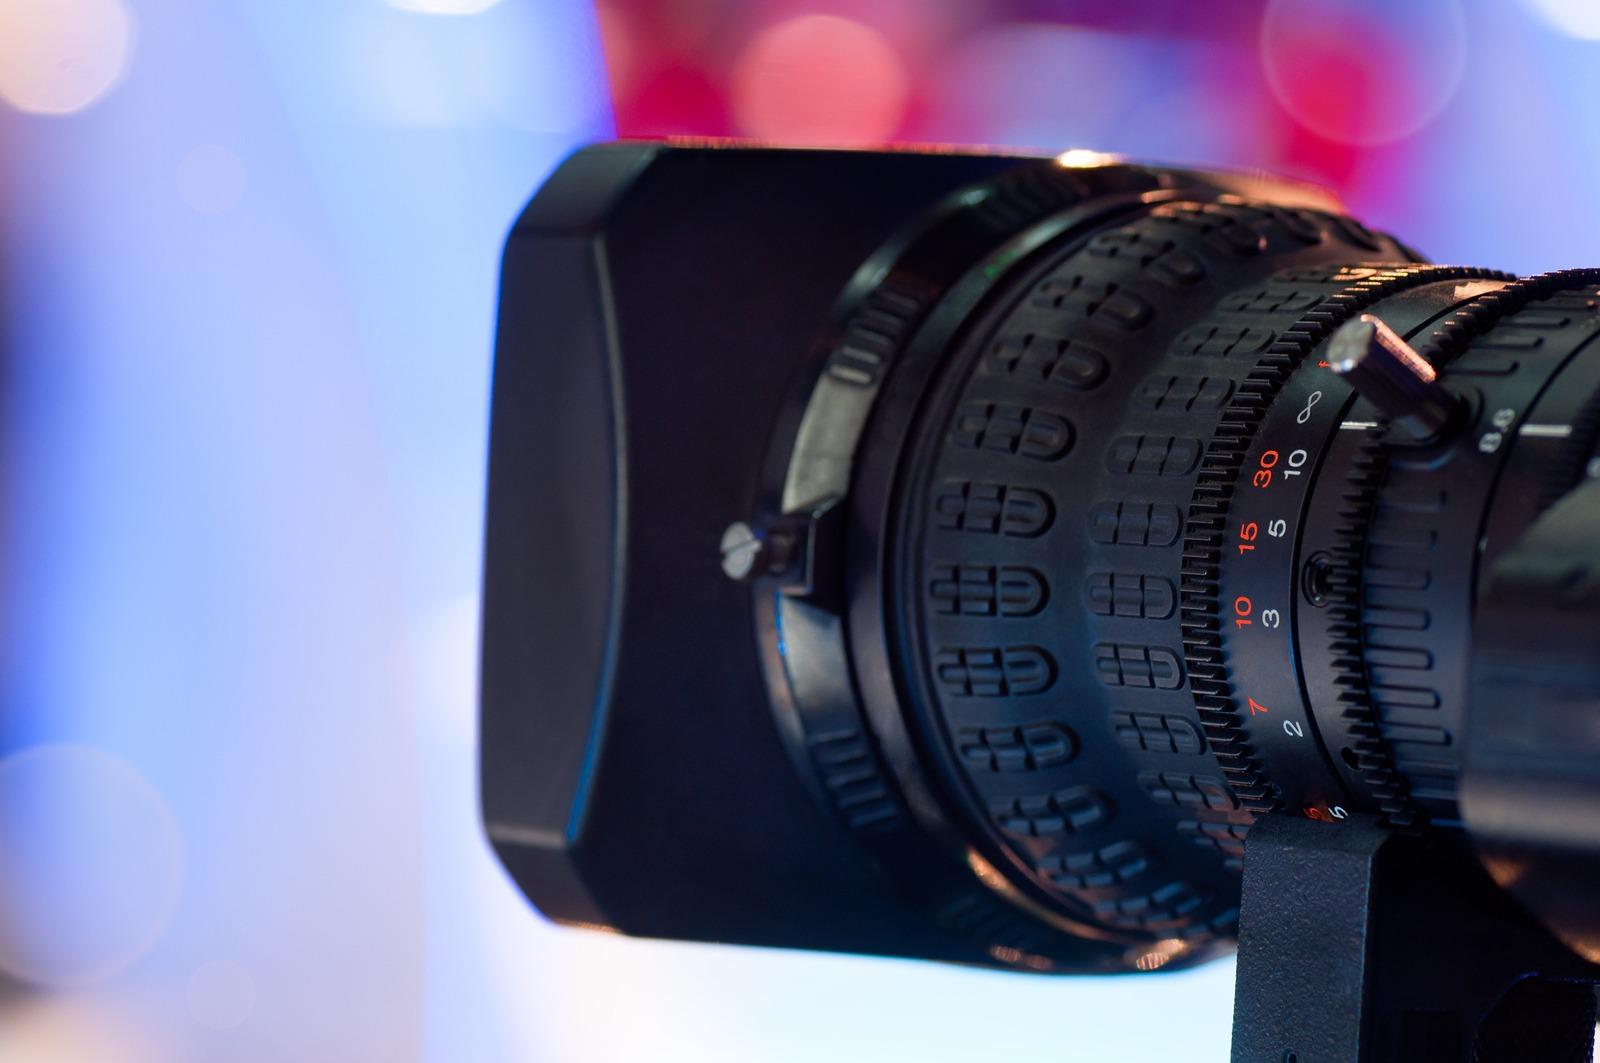 bigstock-Digital-Video-Camera-Lens-31622753